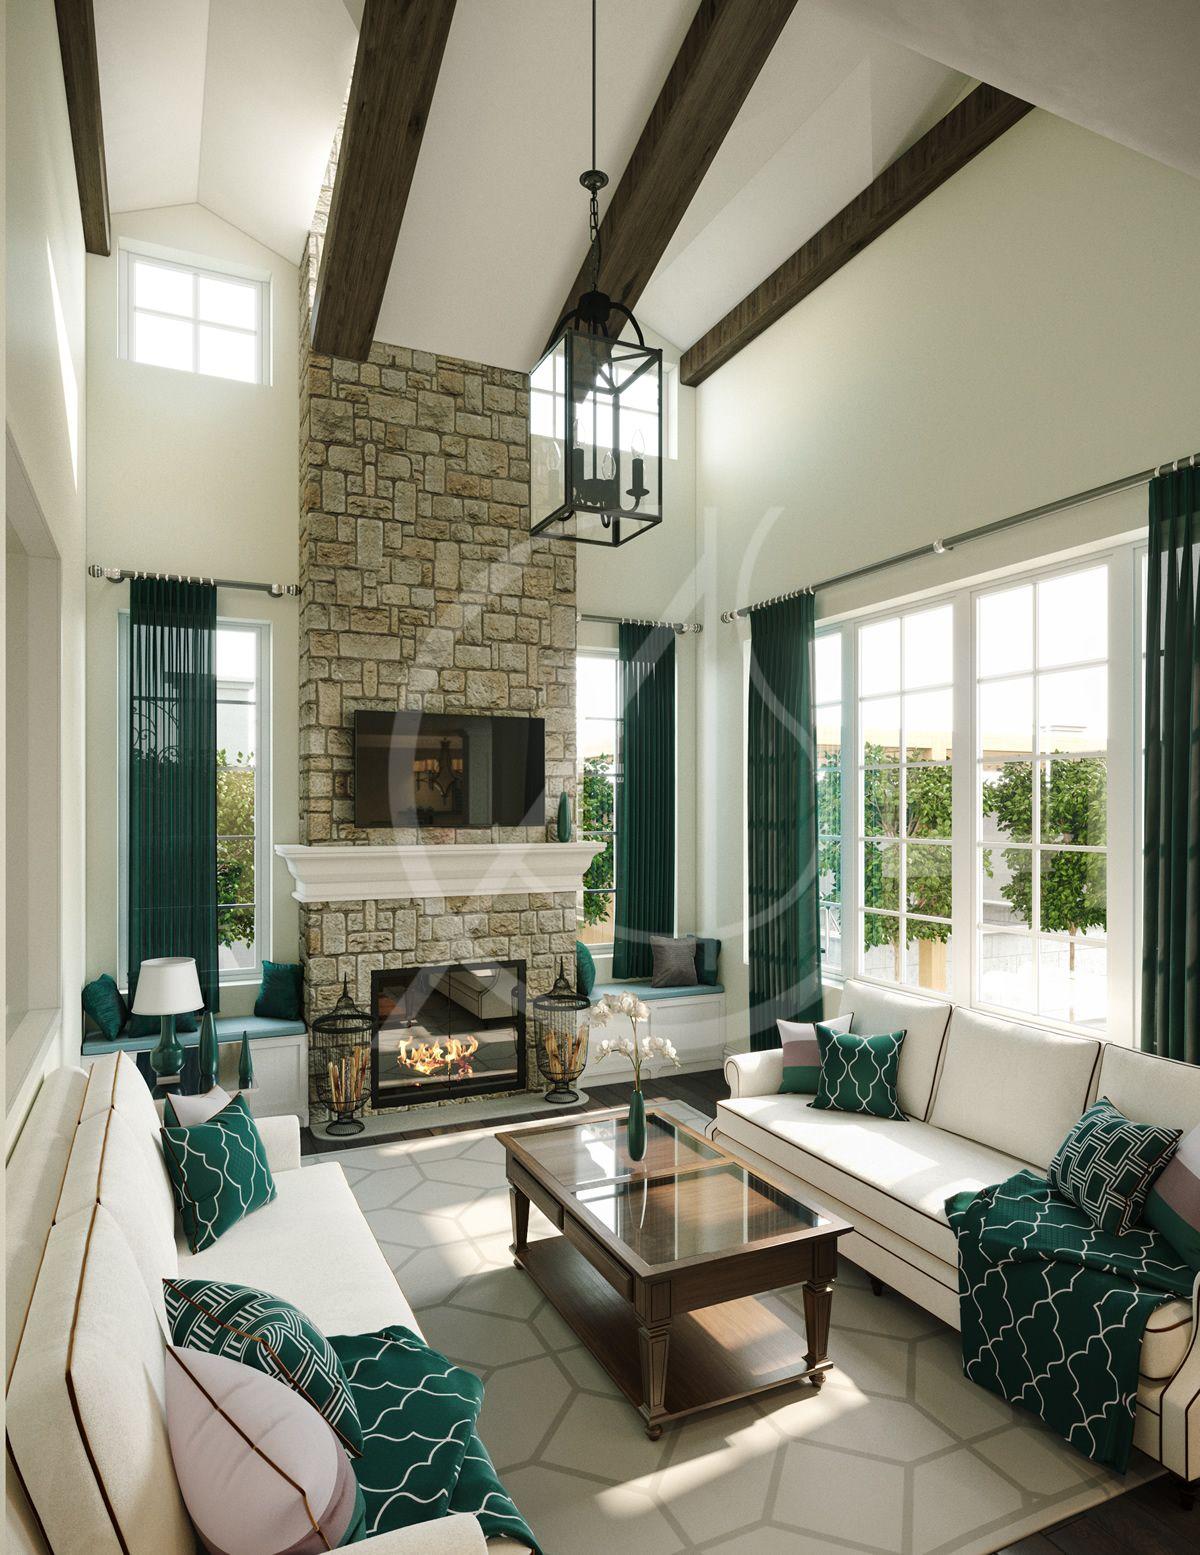 American Style House Interior Design In Dammam Cas American Style House Stone Wall Interior Design American Style Interior